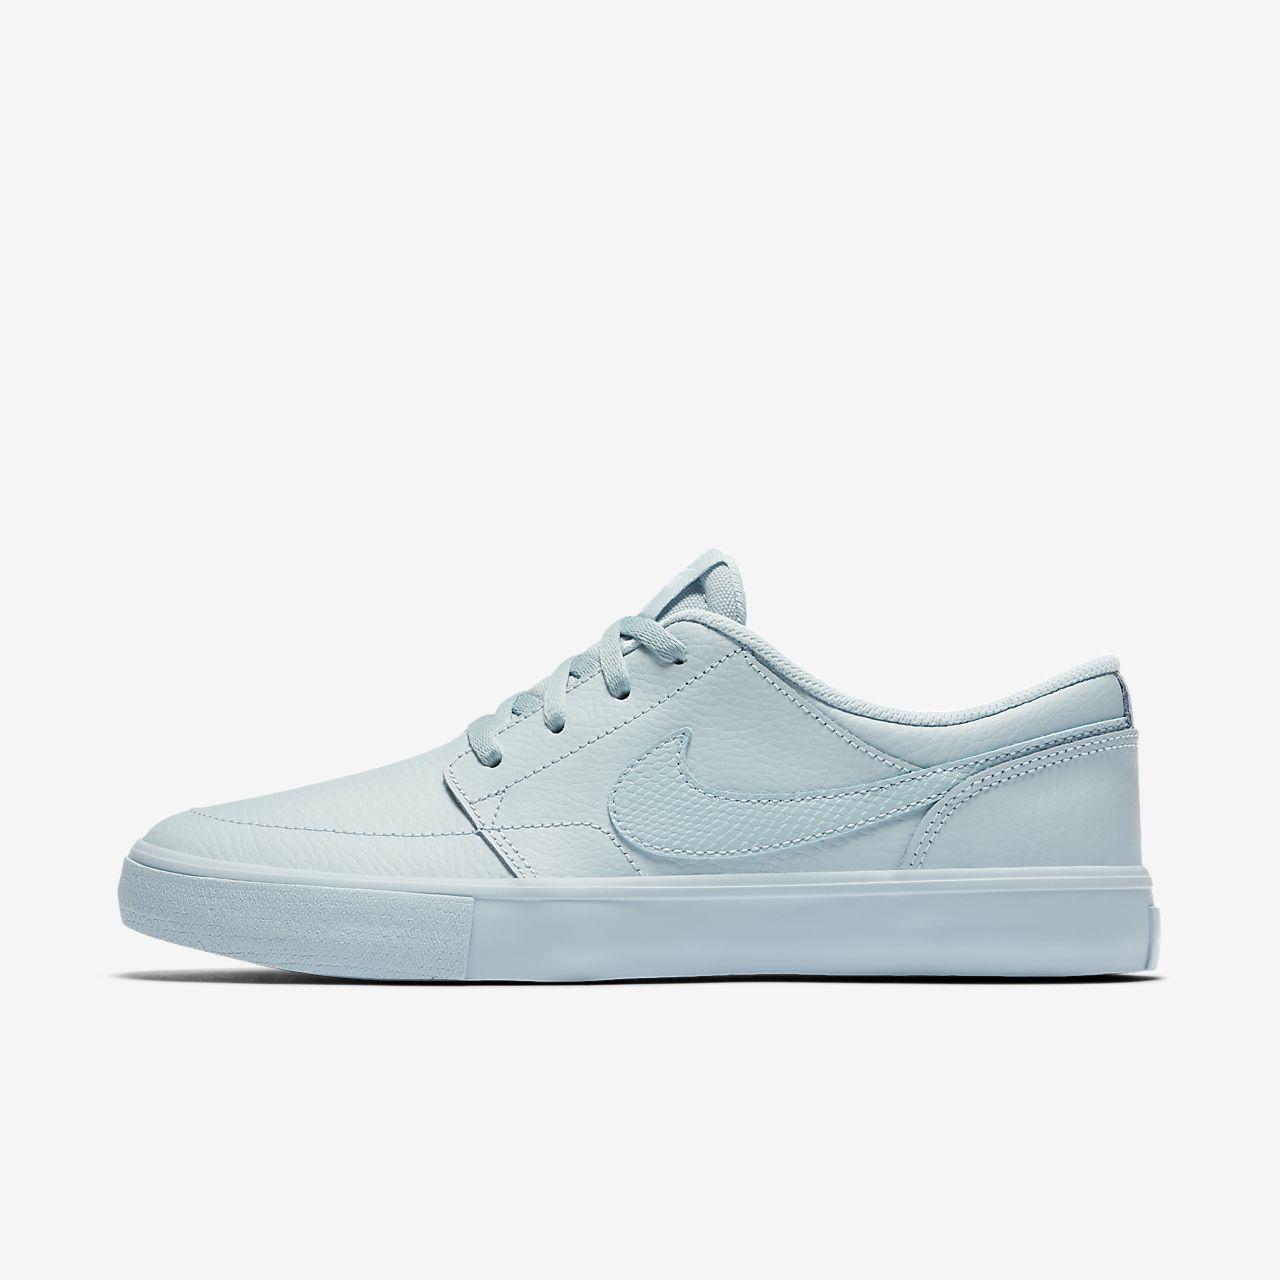 Nike SB Portmore II Damen-Skateboardschuh - Blau FT6pPt